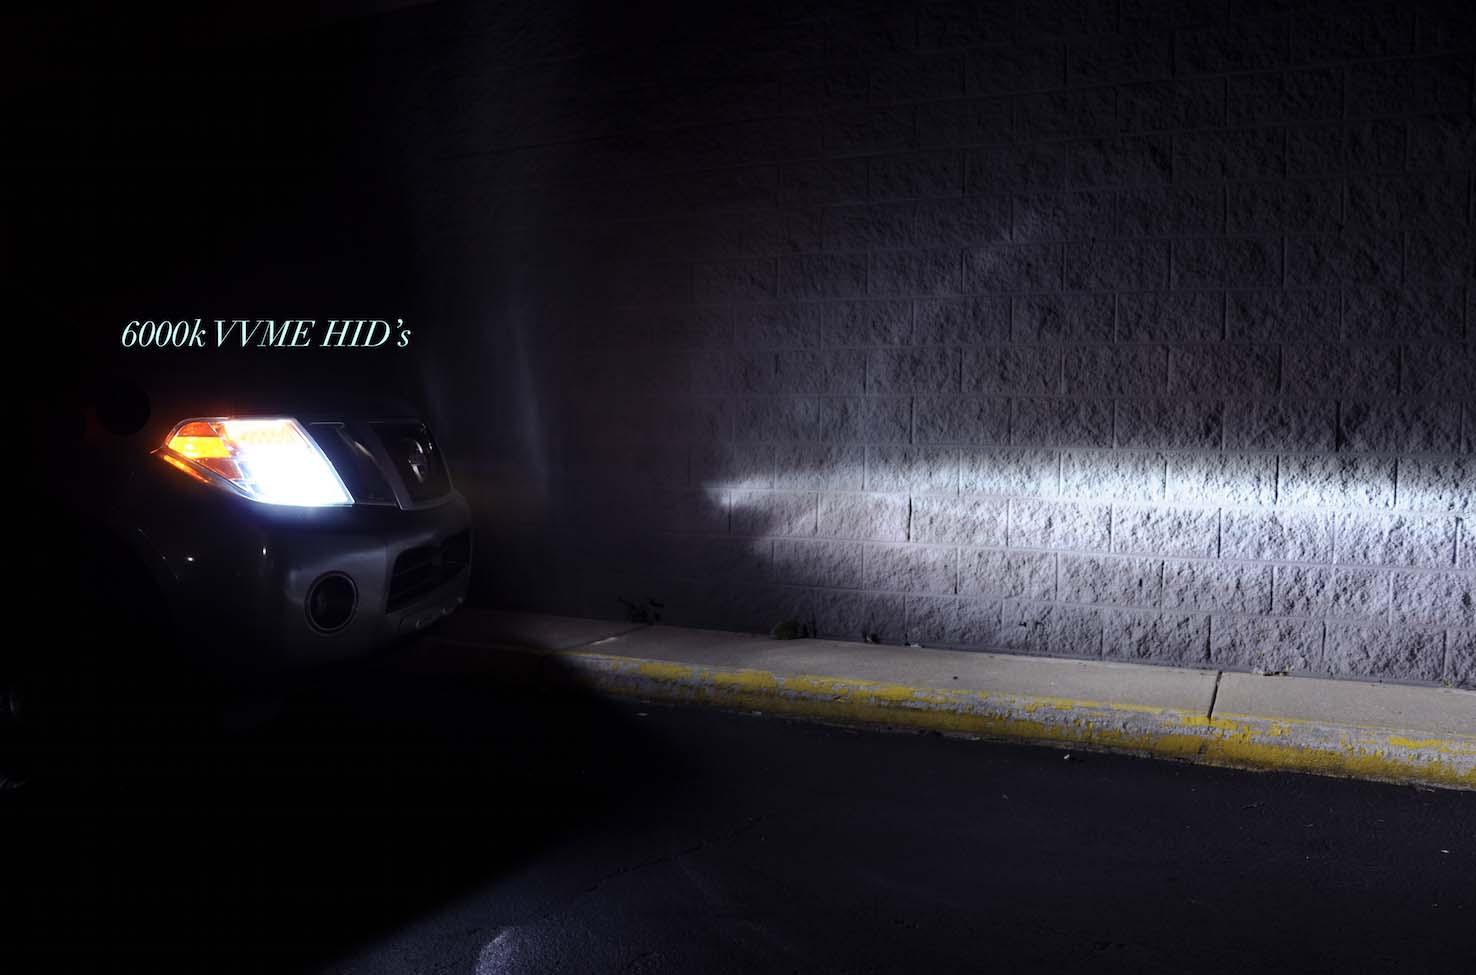 vvme 6000k hid headlights headlight reviews rh headlightreviews com Headlight Socket Wiring Diagram Xentec HID Wiring-Diagram